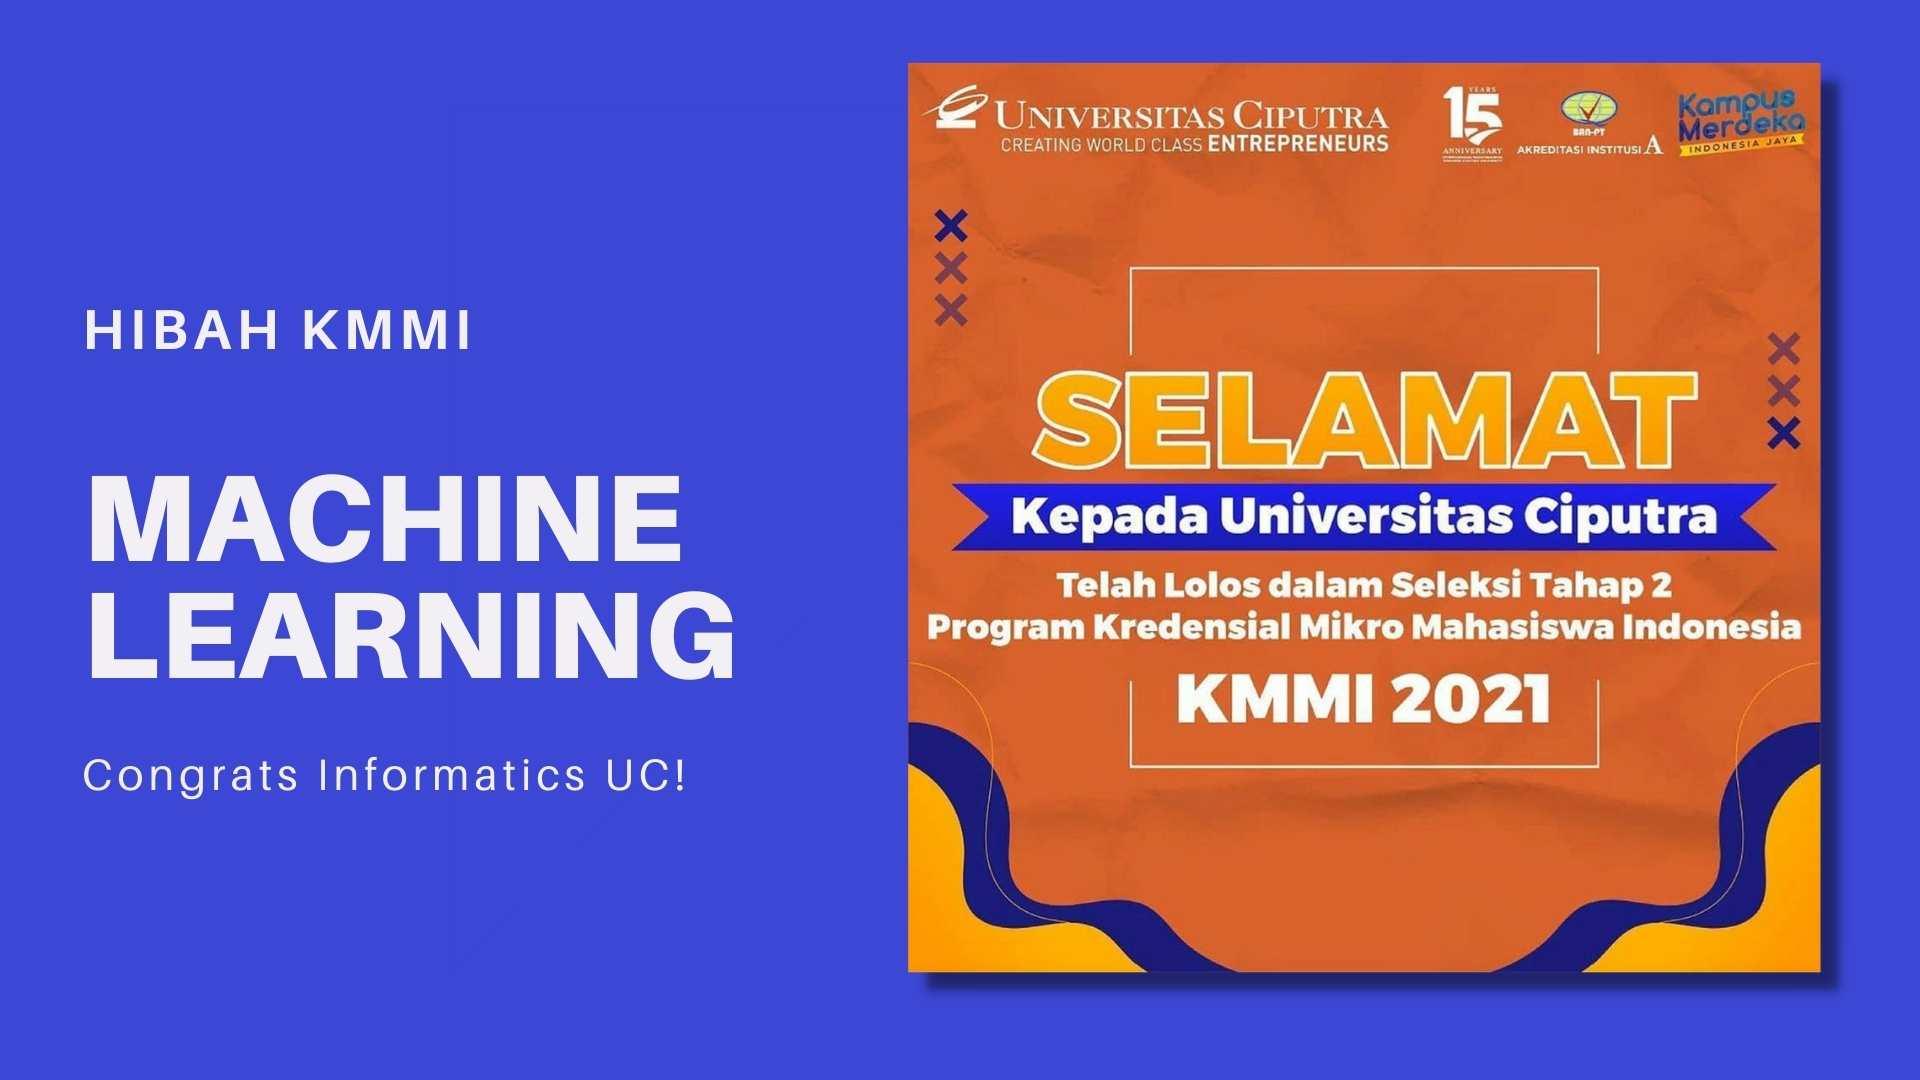 Informatika UC - Hibah KMMI